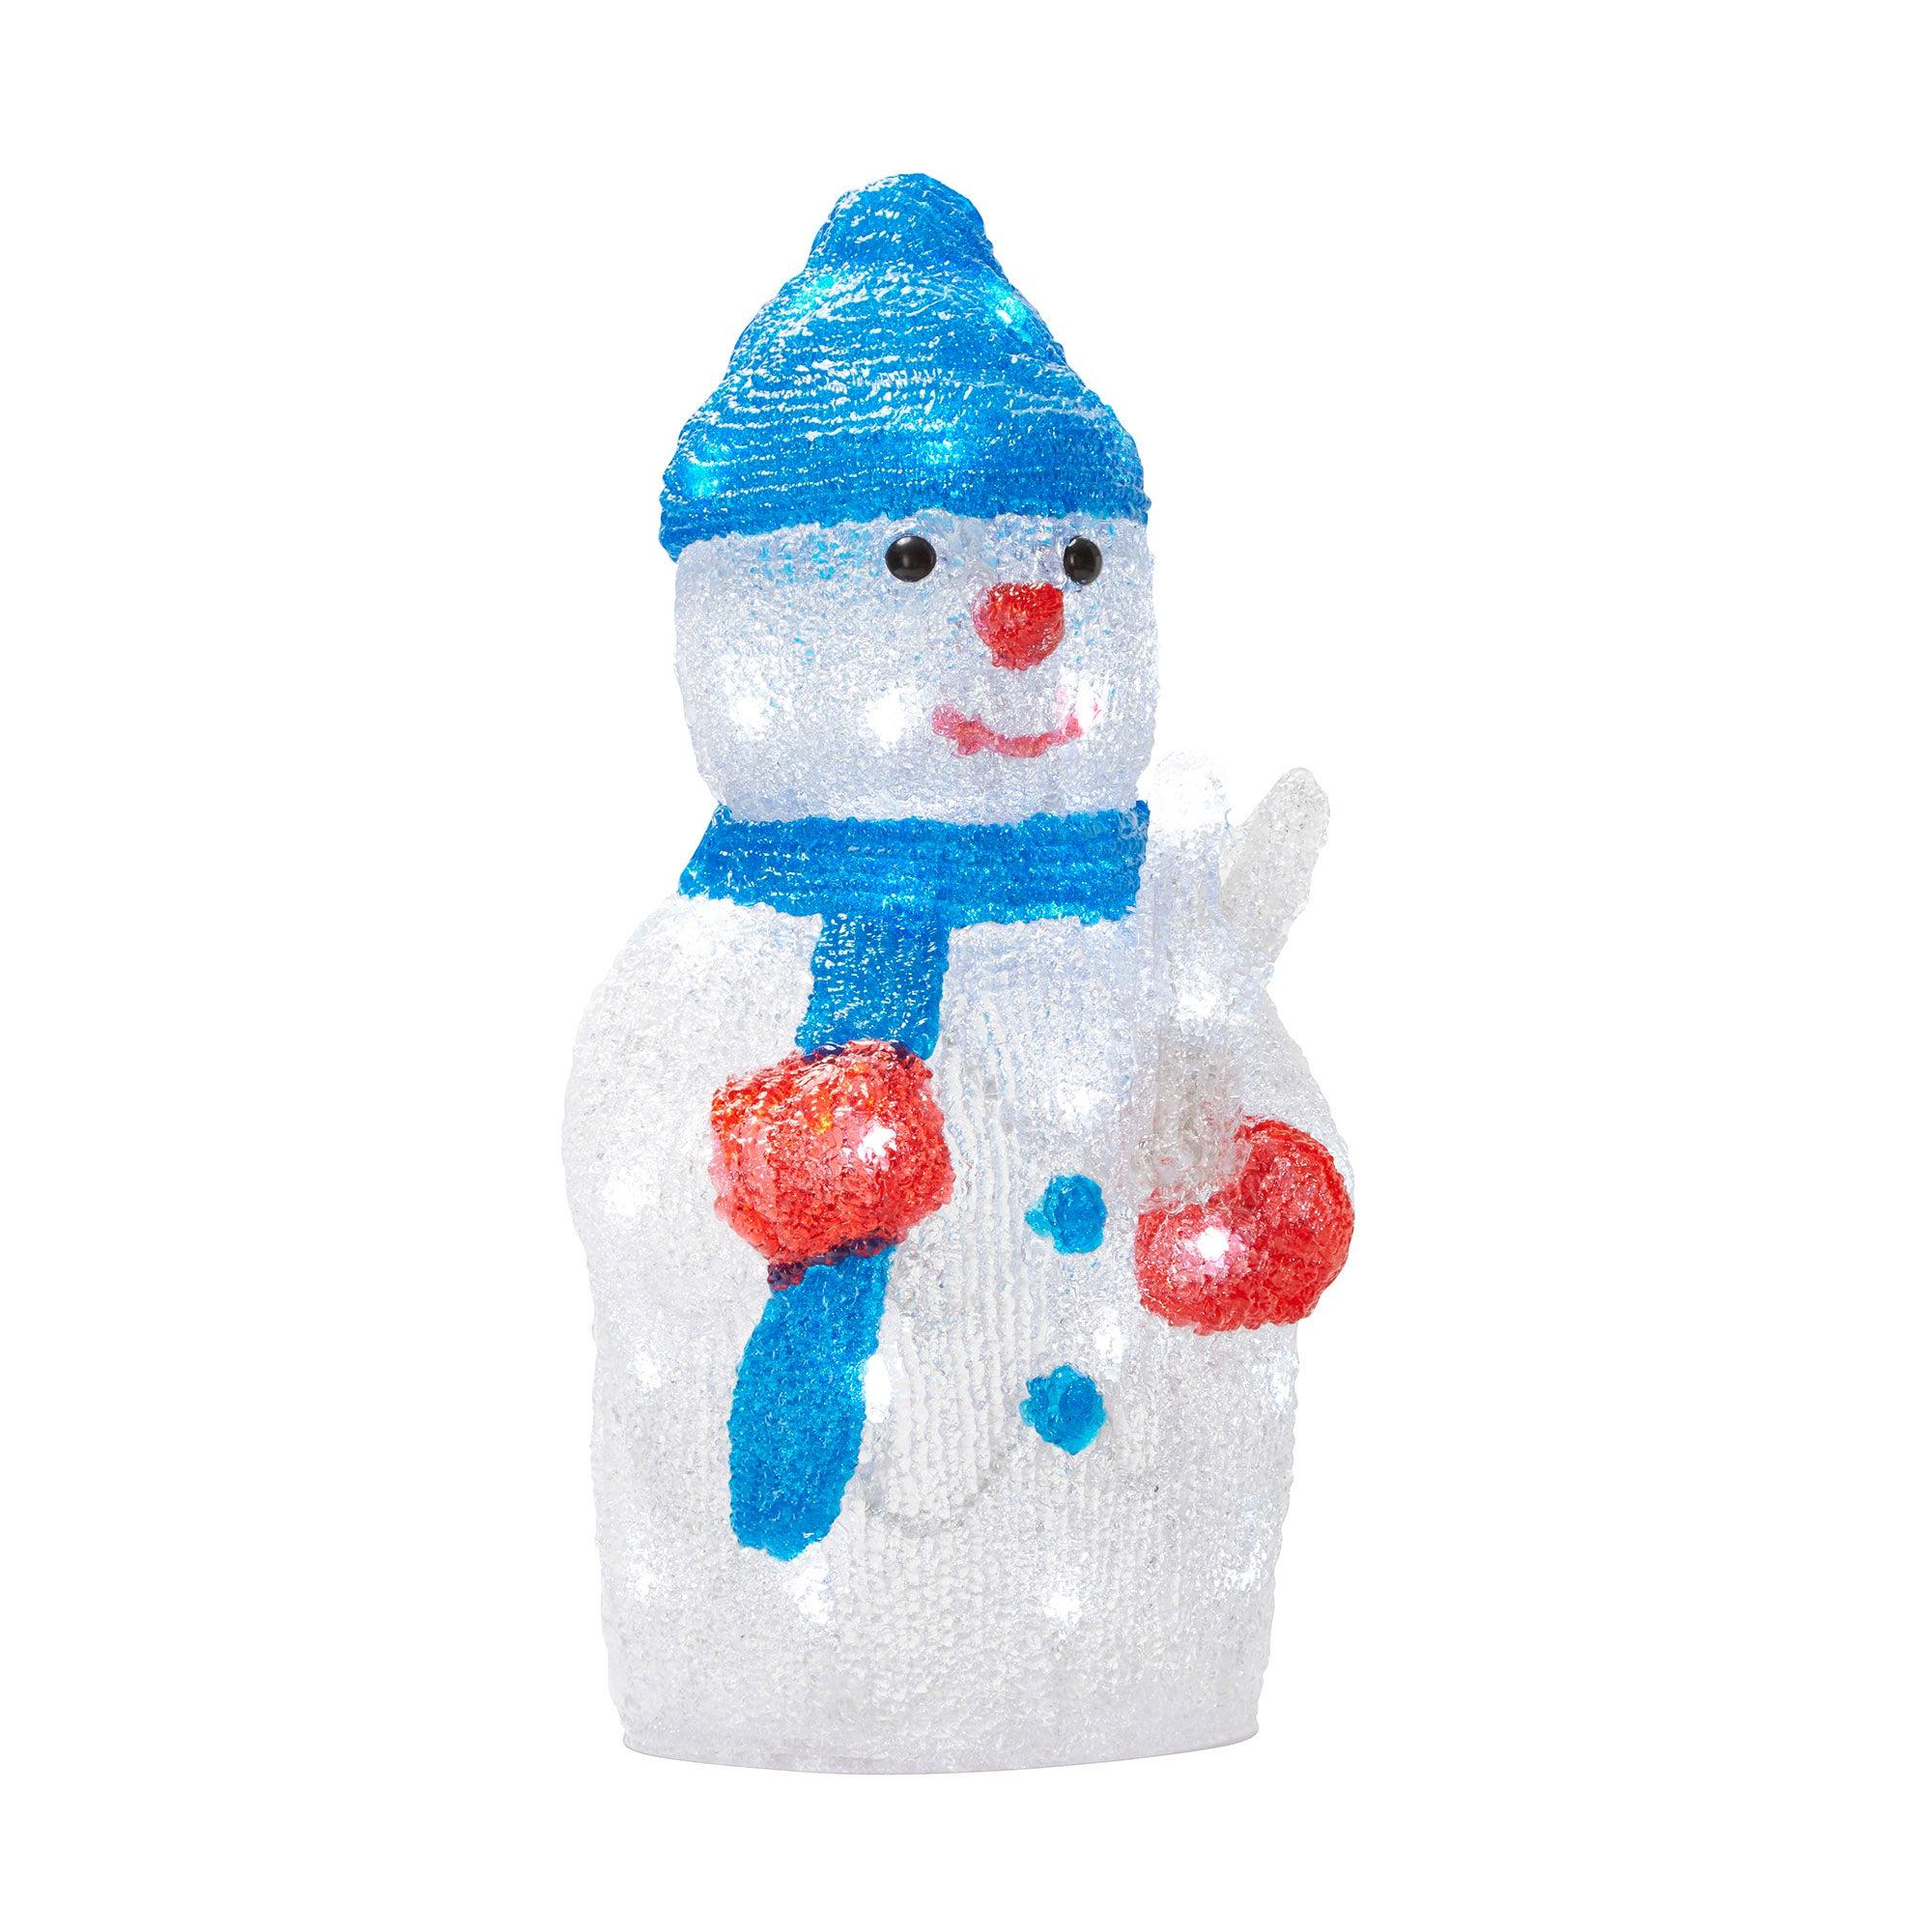 Xms14 Acrylic Snowman with 32LEDs